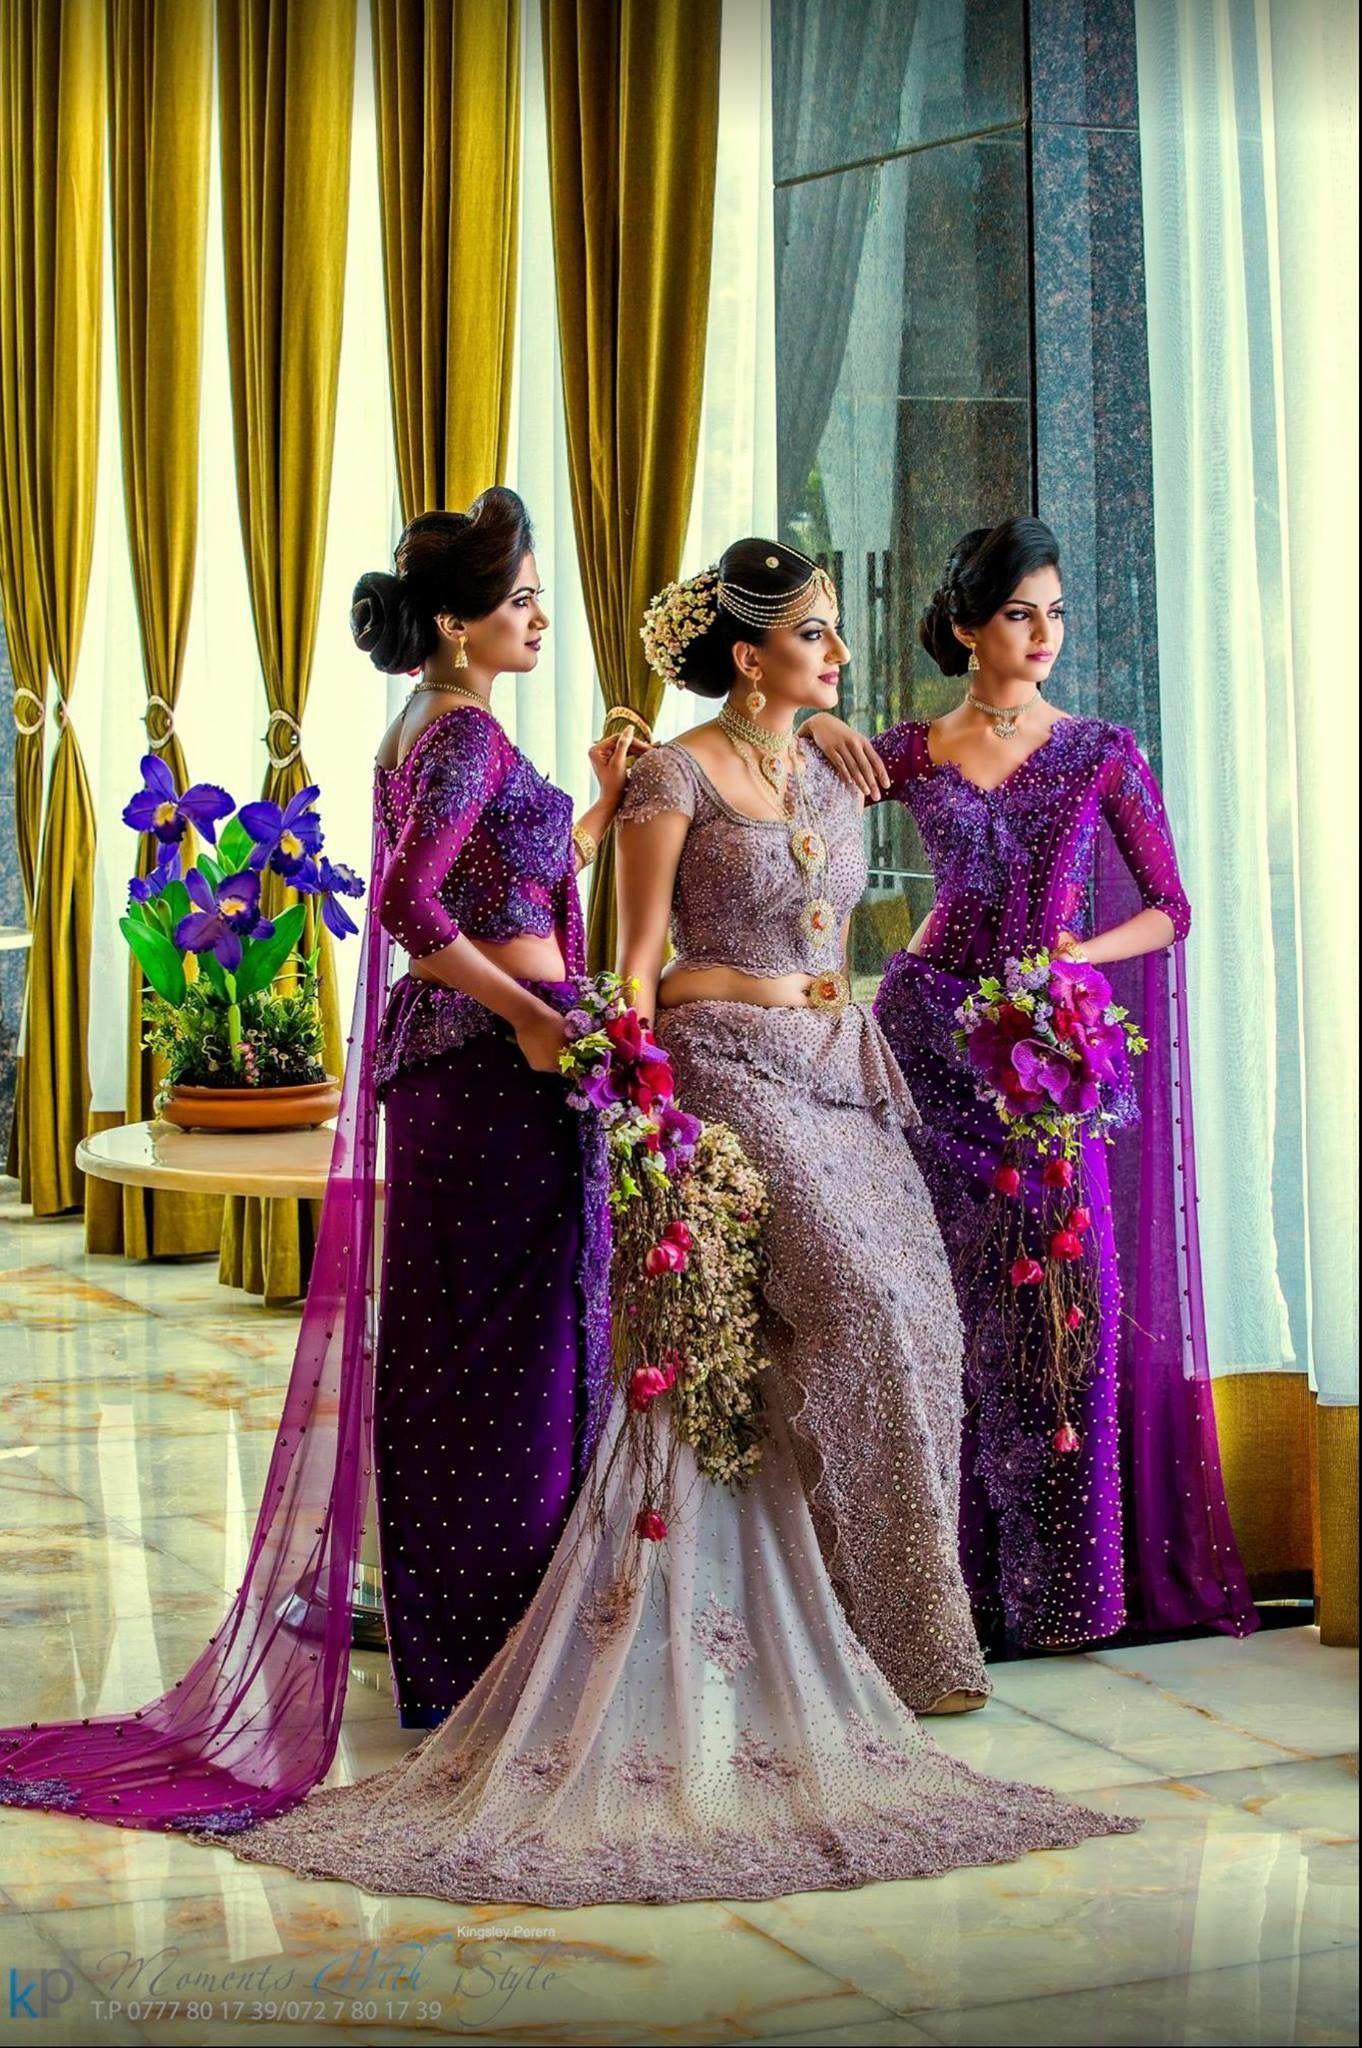 Wedding decorations lavender september 2018 Pin by Neranjala on Bridal in   Pinterest  Wedding Bridesmaid